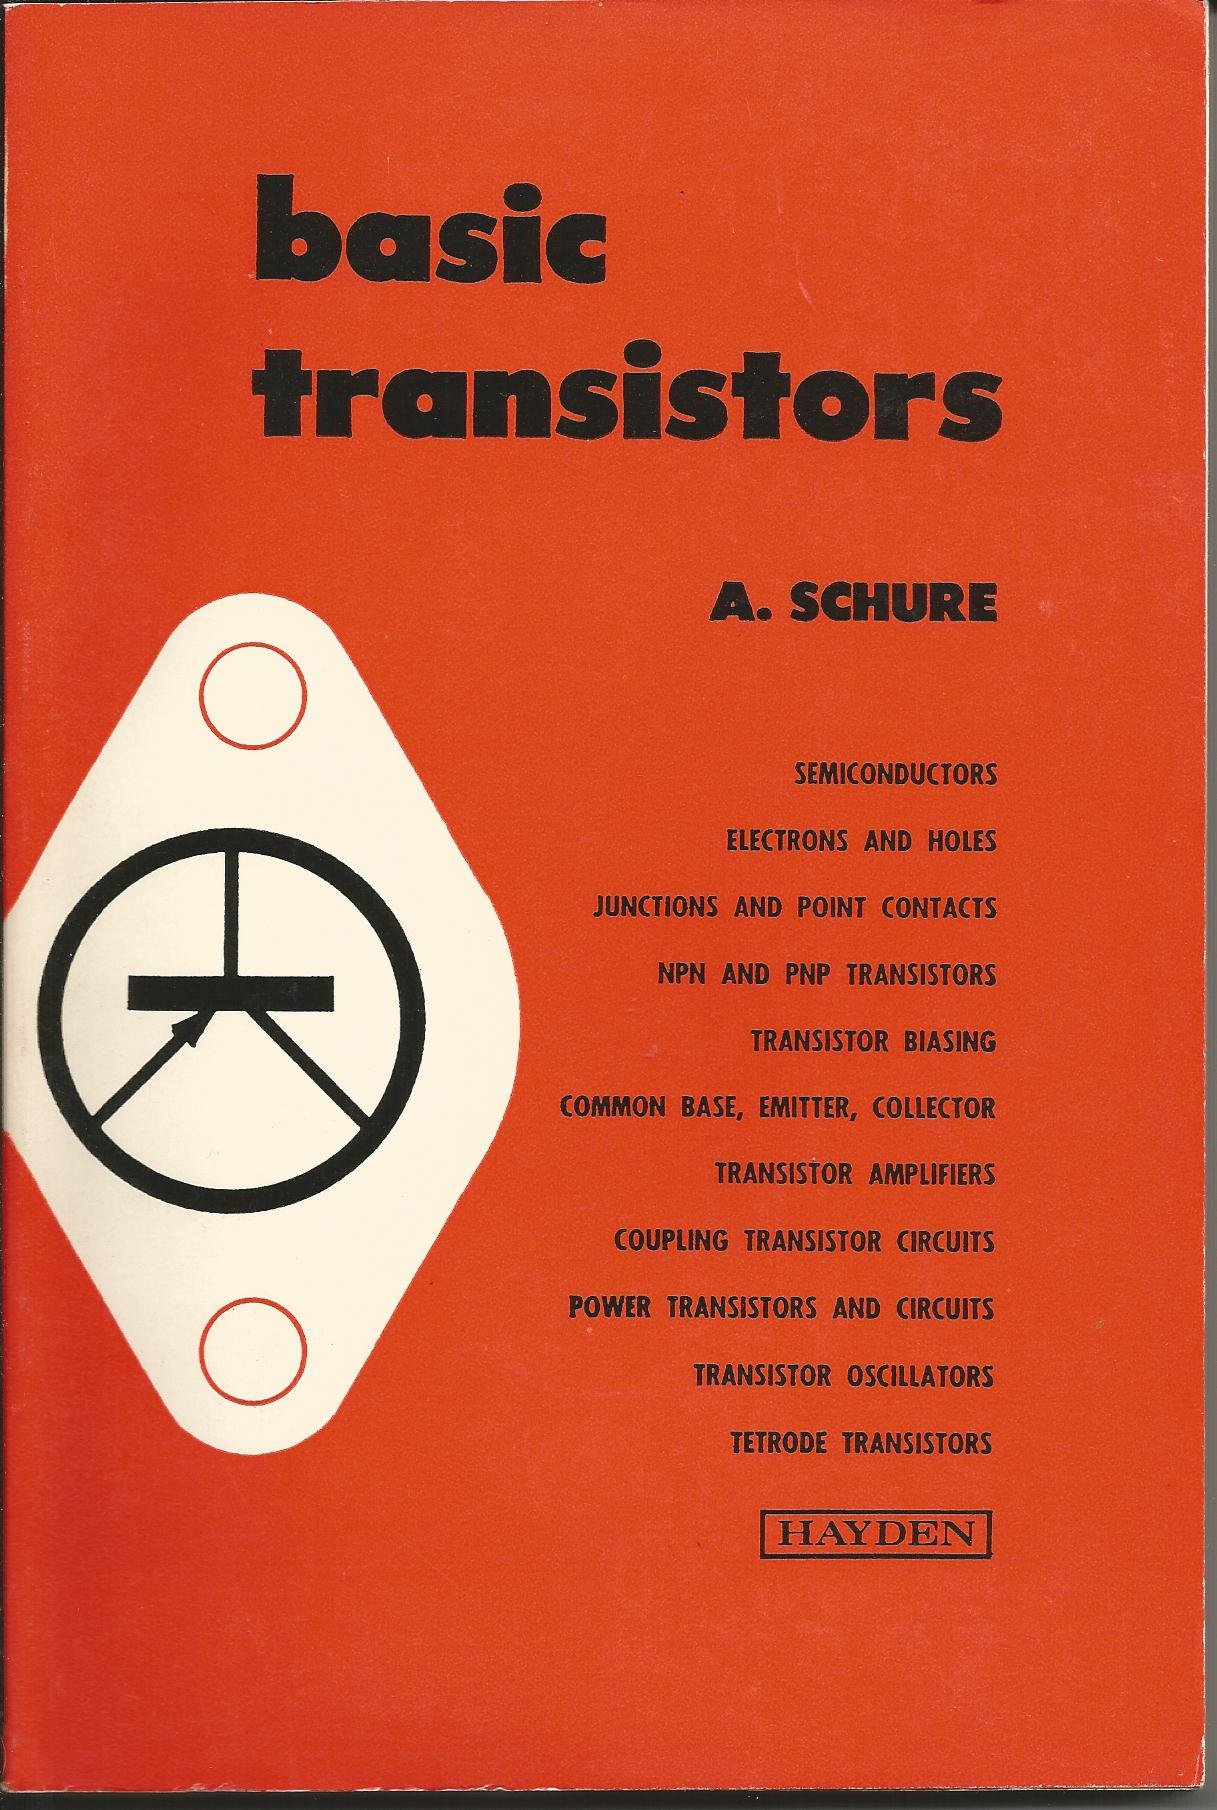 Basic Transistors Alexander Schure 9780810404441 Books Commonbasenpntransistorcircuitjpg